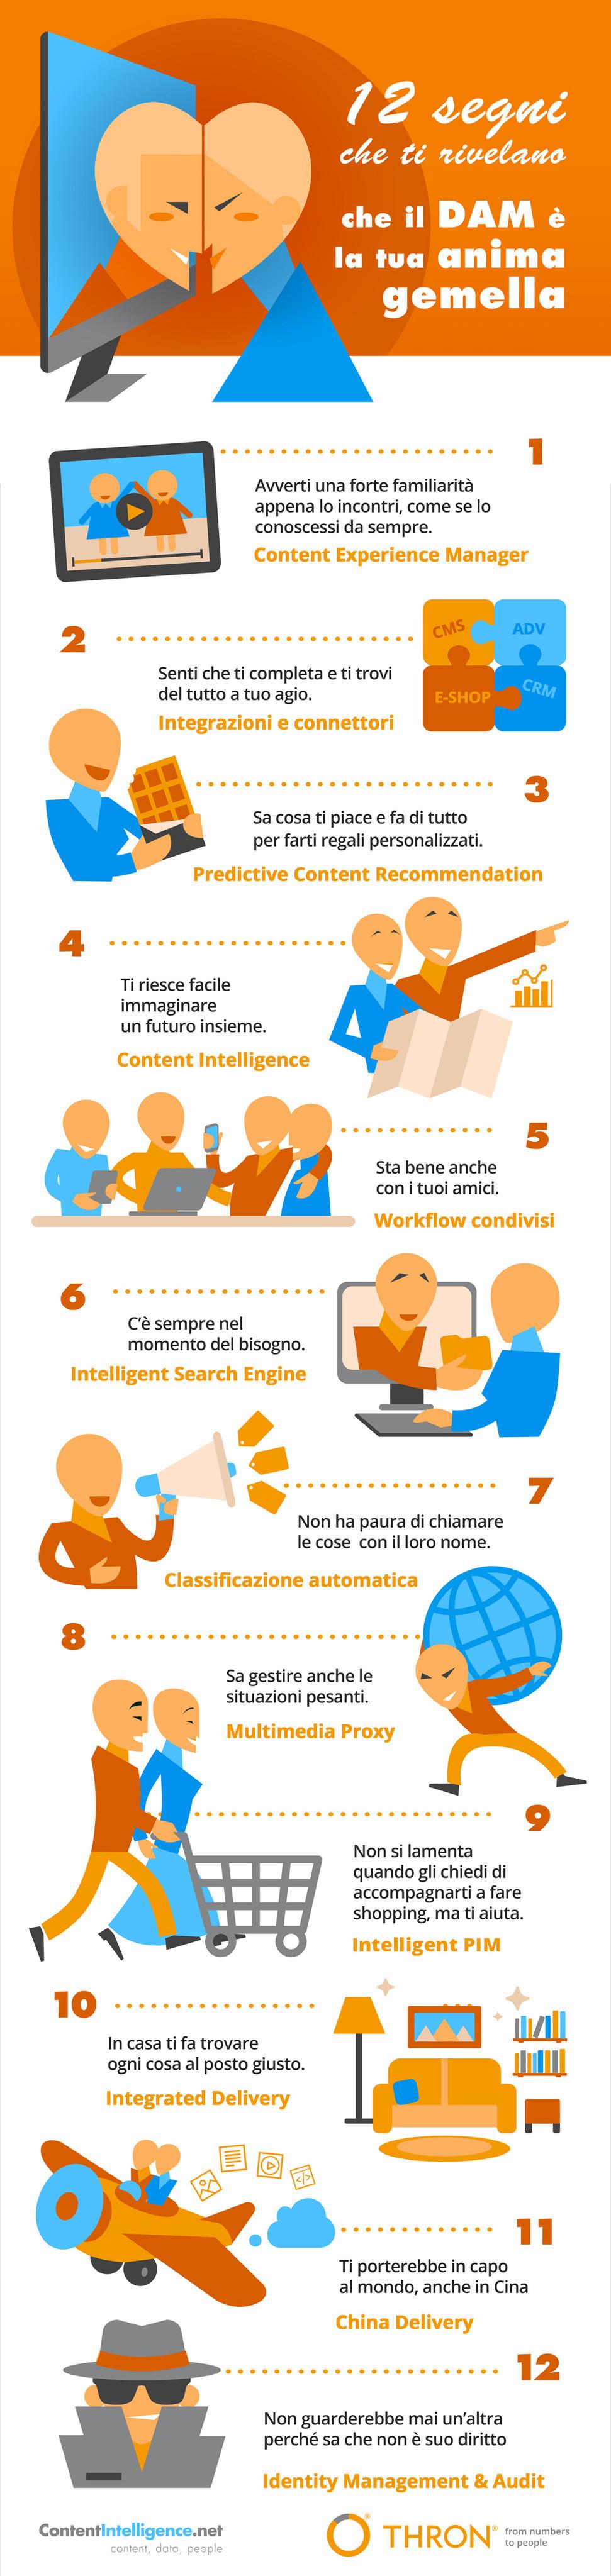 infografica_svalentino_fin